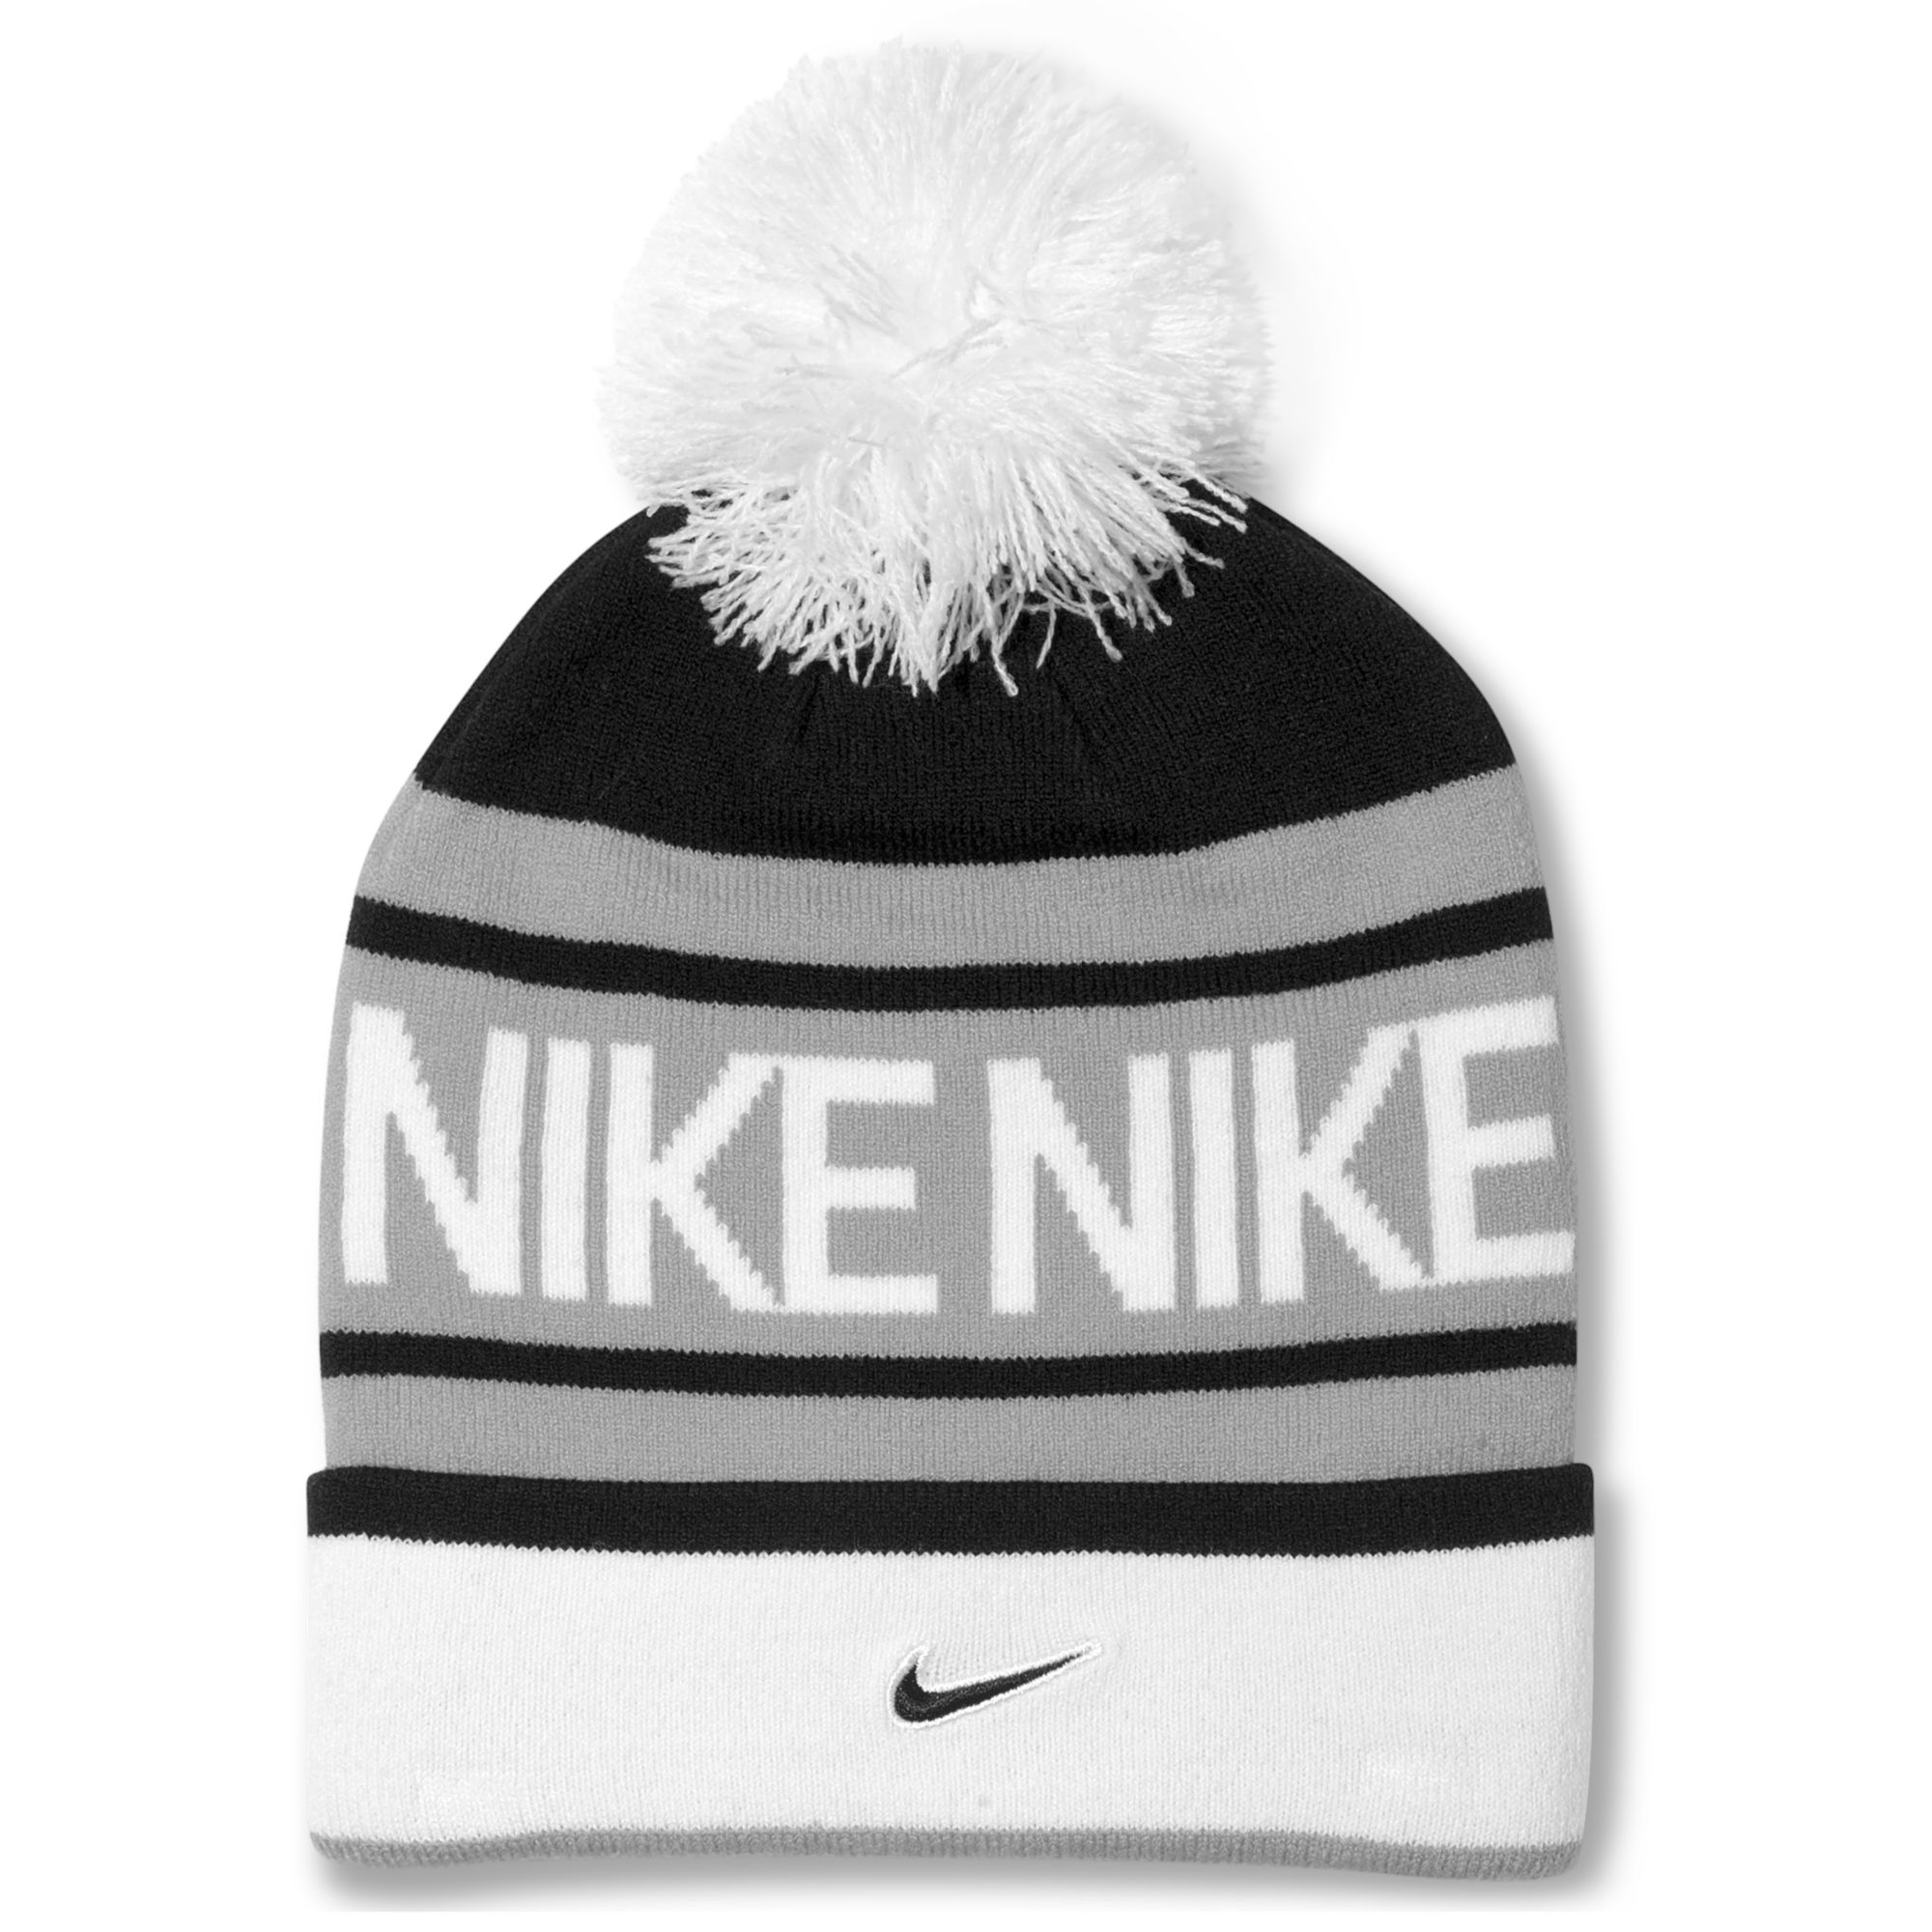 Nike Beanie Pom Hat - Hat HD Image Ukjugs.Org 23e977aad